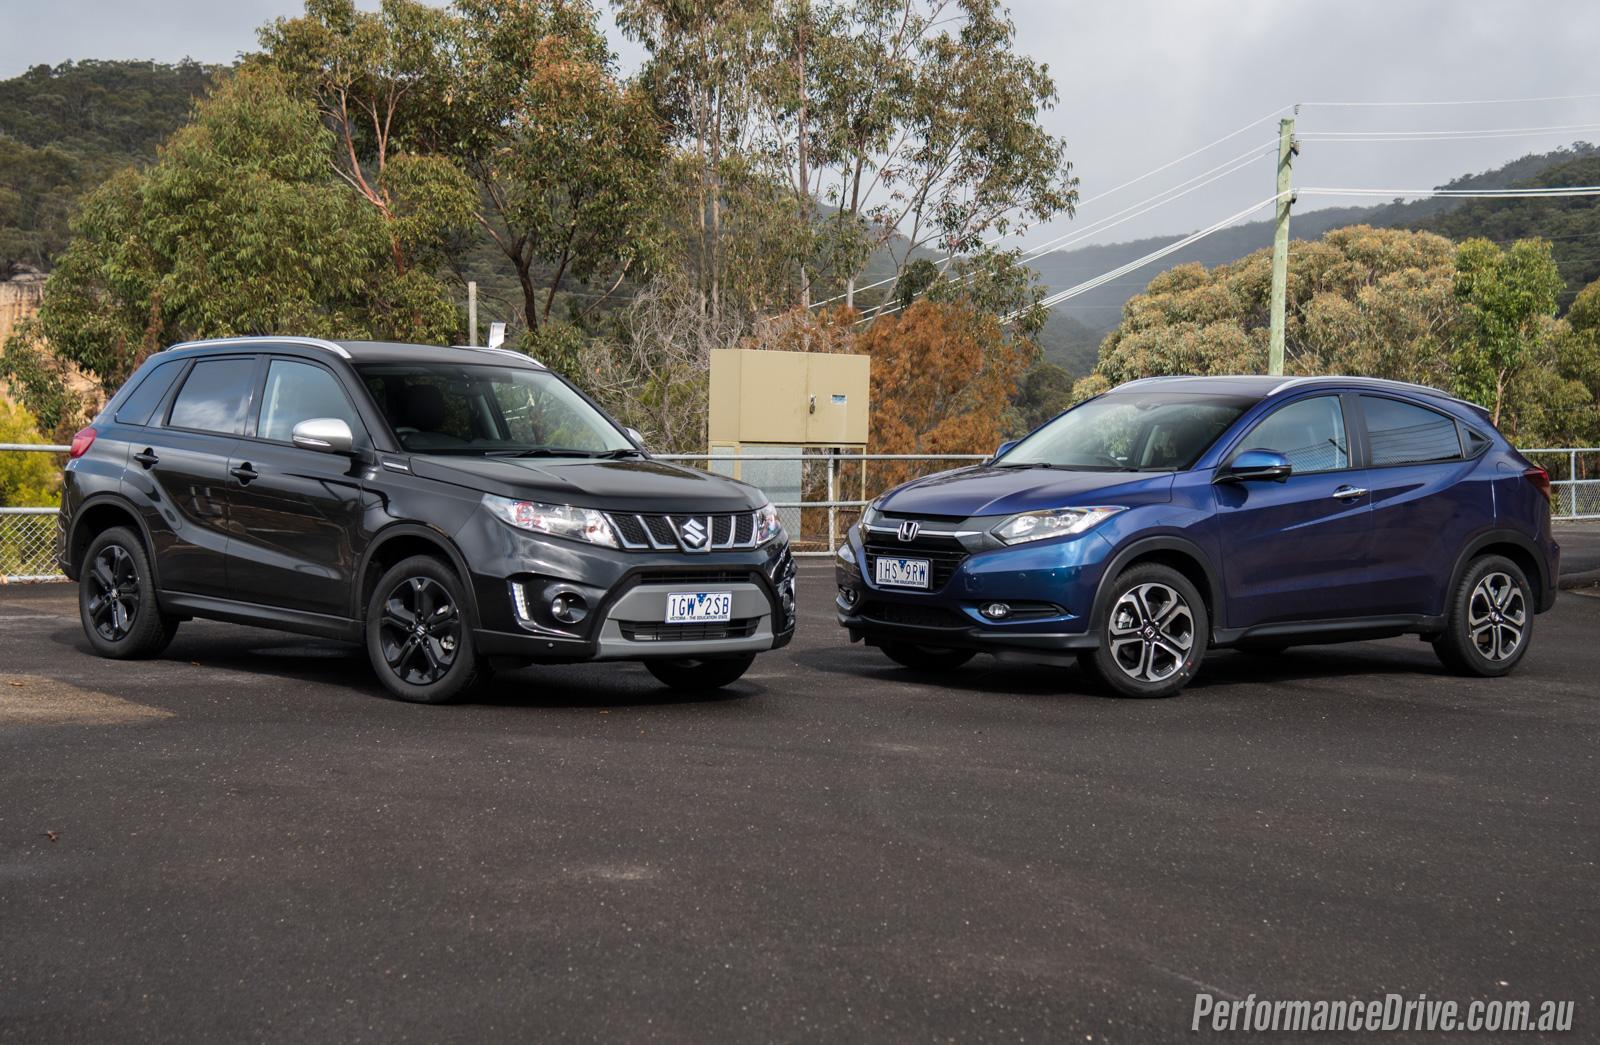 2016 suzuki vitara turbo vs honda hr v small suv for Honda hrv vs honda crv